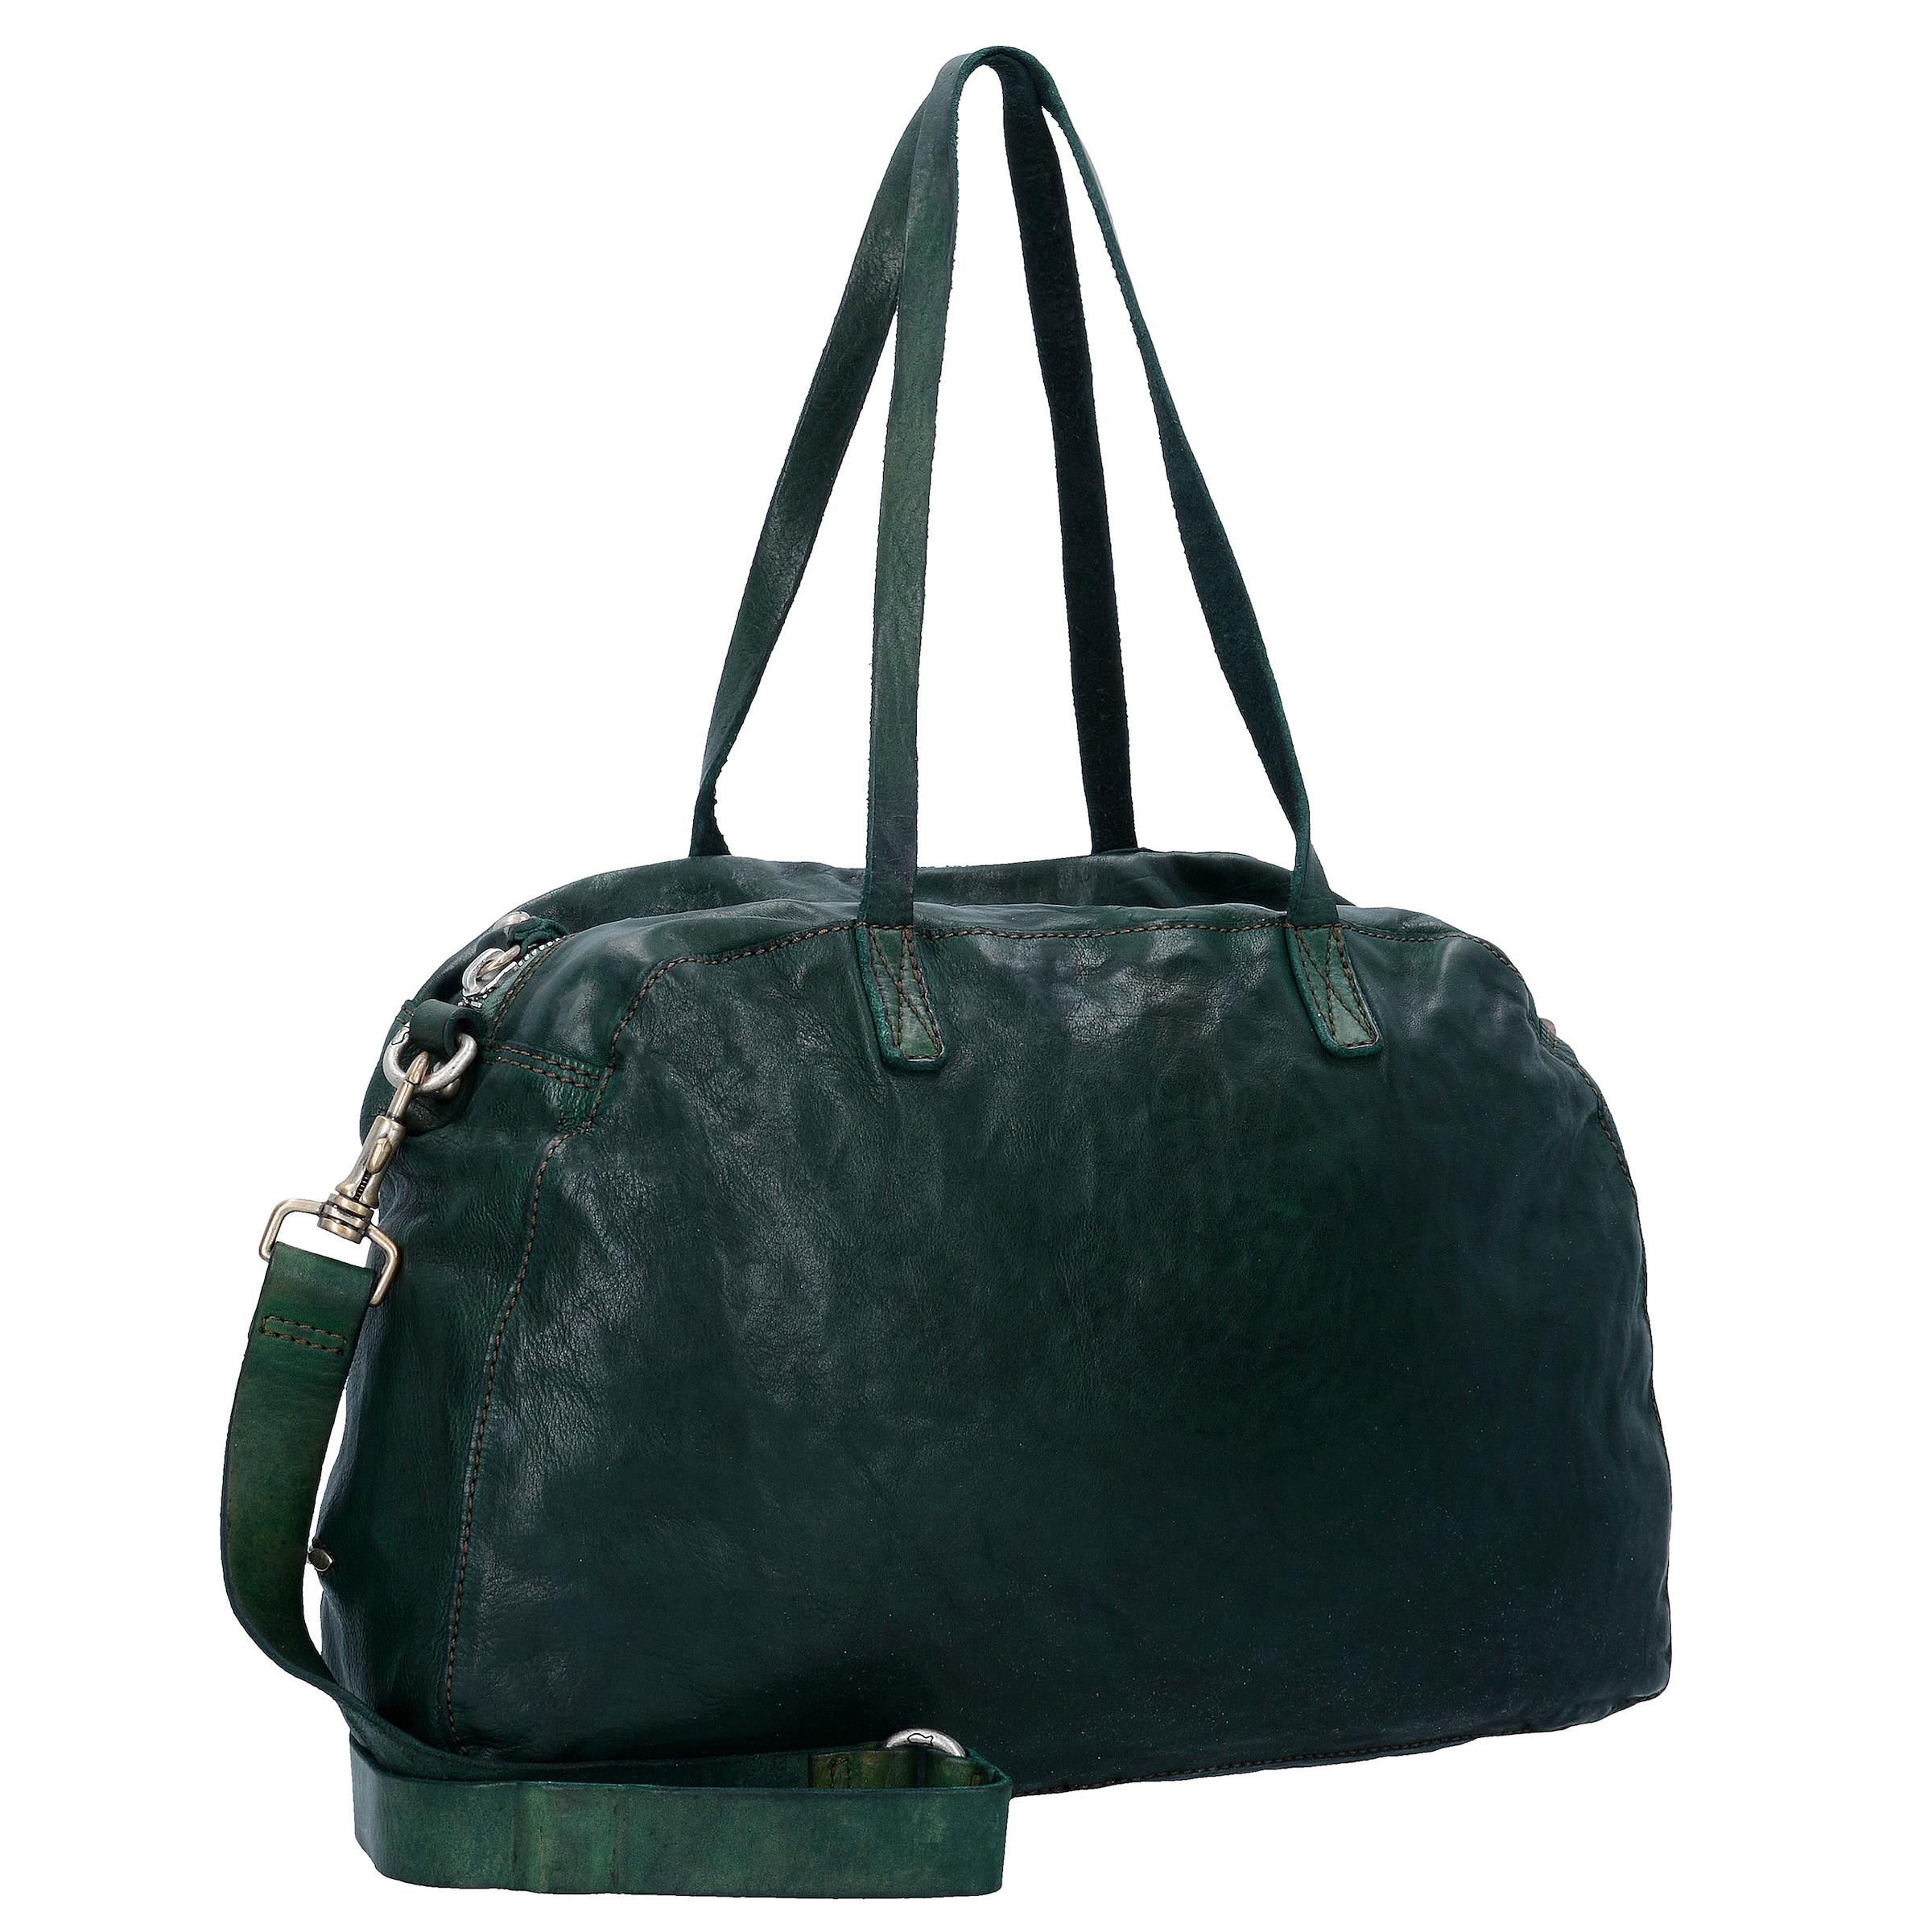 Campomaggi Traditional Peonia Schulterhandtasche Leder 33 cm Unisex Rabatt Kaufen Rabatt Nicekicks LrMerZ